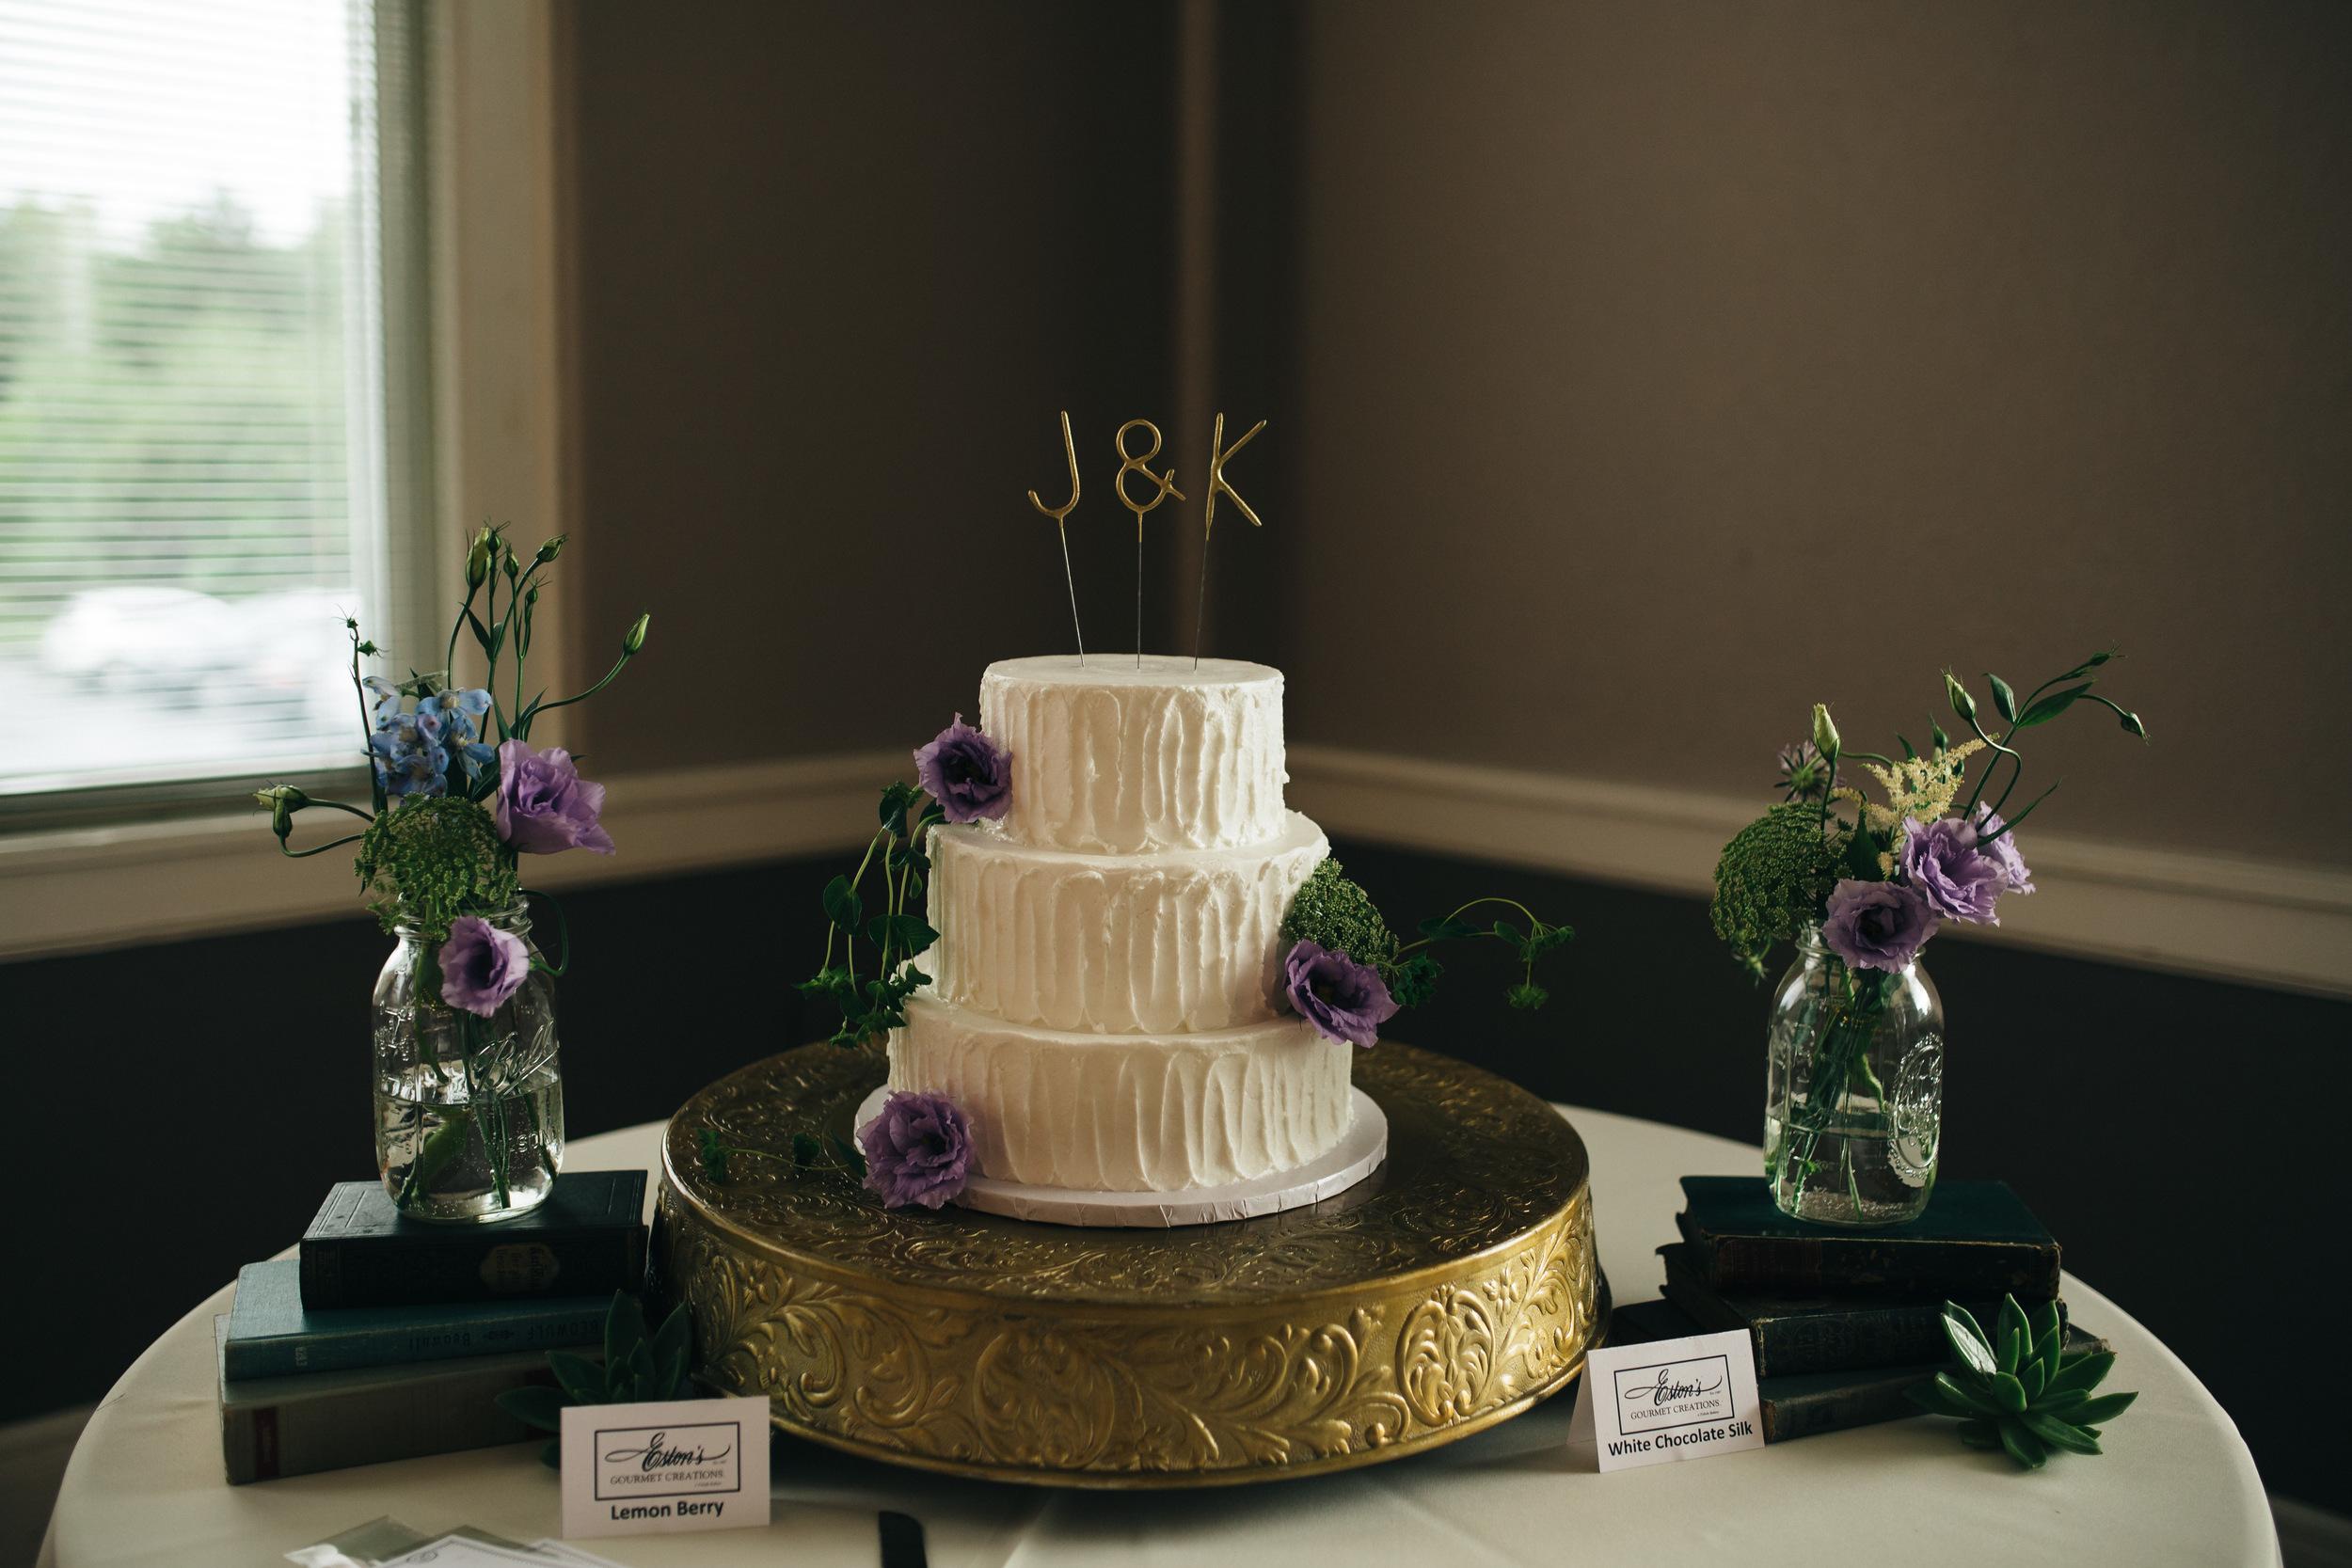 Eston's Bakery wedding cake from Toledo, Ohio.